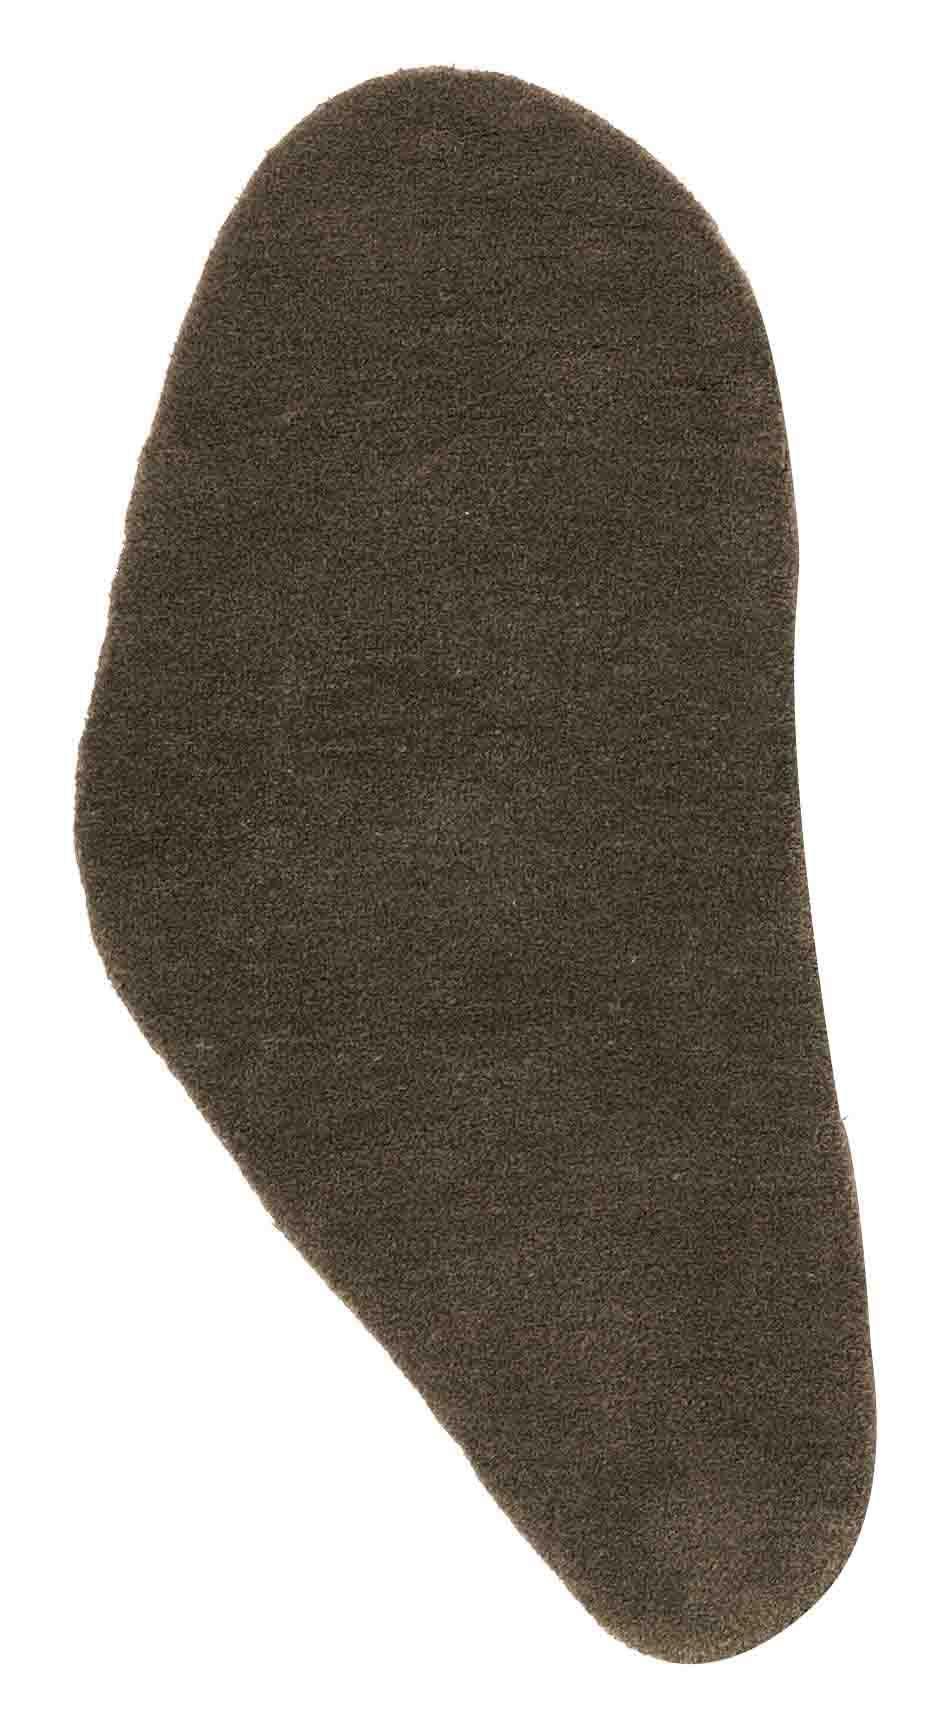 Möbel - Teppiche - Little Stone 11 Teppich 55 x 110 cm - Nanimarquina - 55 x 110 cm - schiefergrau - Wolle